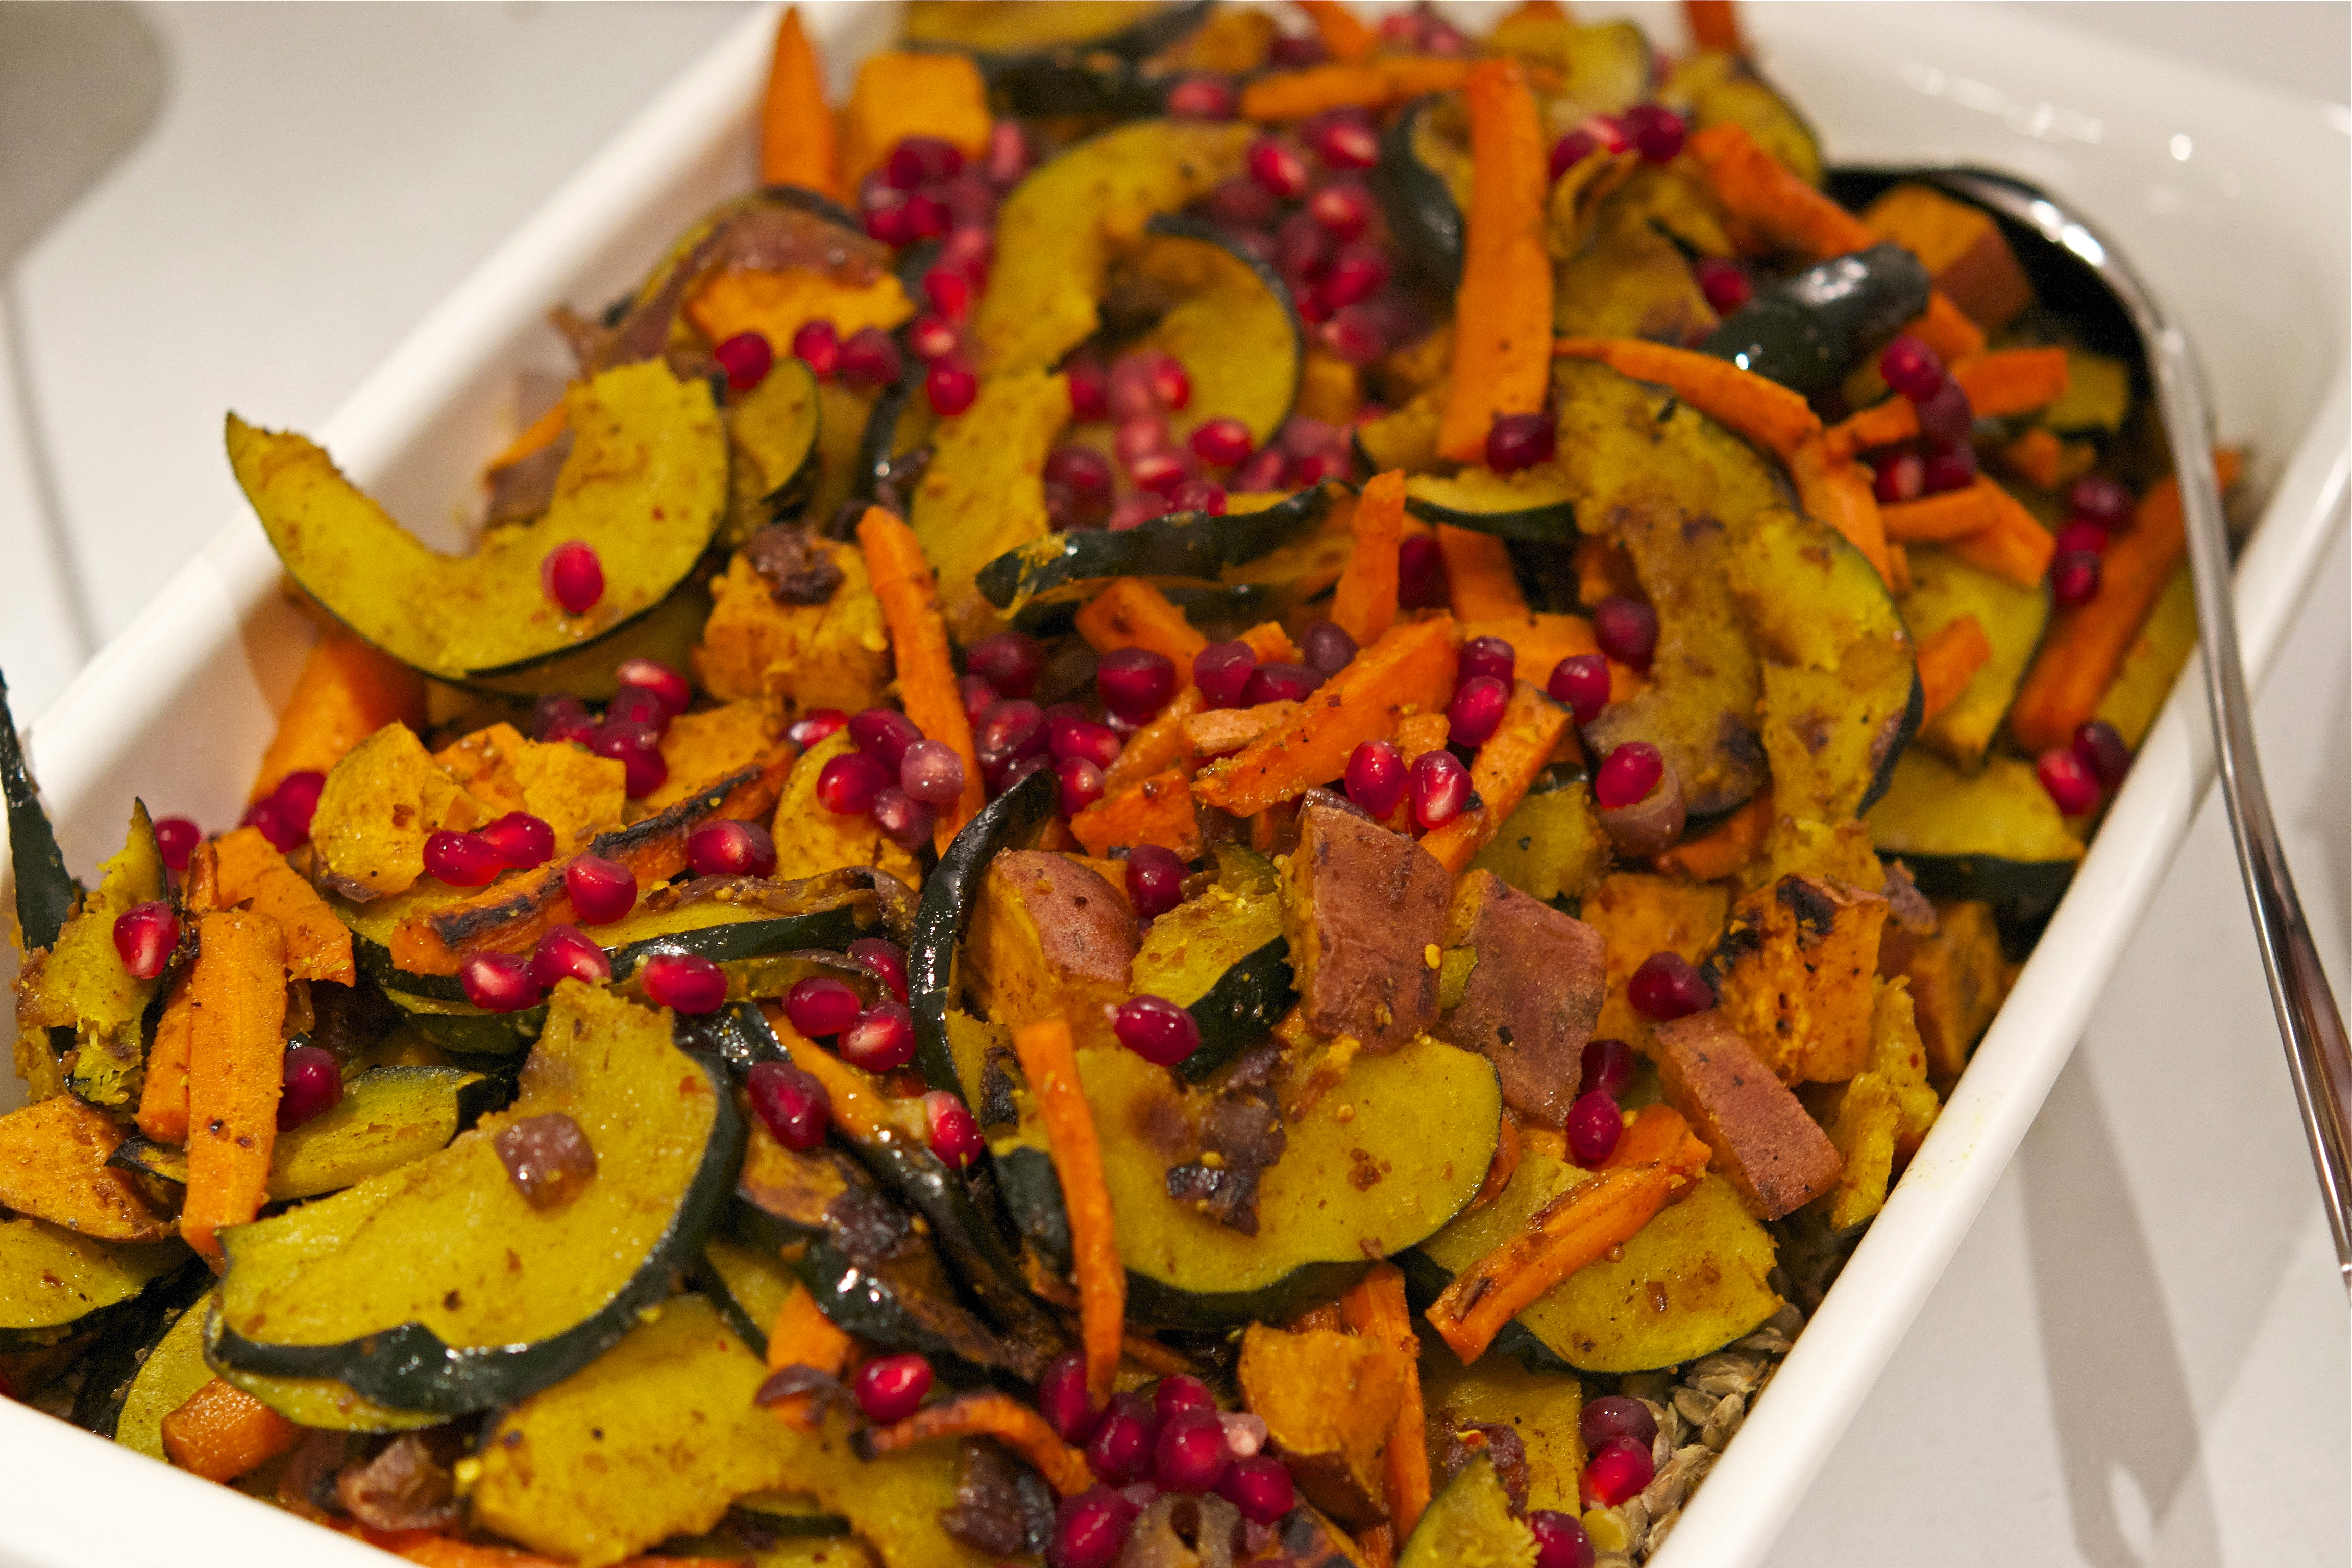 Indian Spiced Roasted Vegetables Over Lentils The